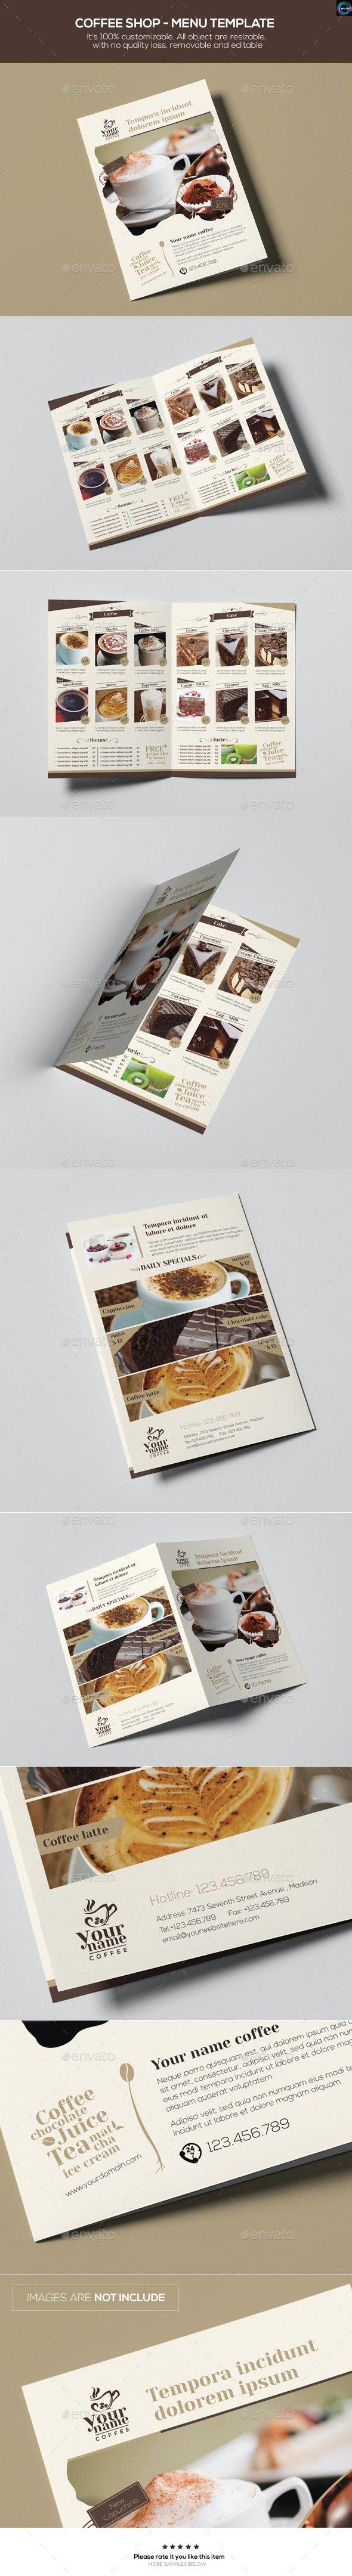 Coffee Shop - Menu Template - Food Menus Print Templates